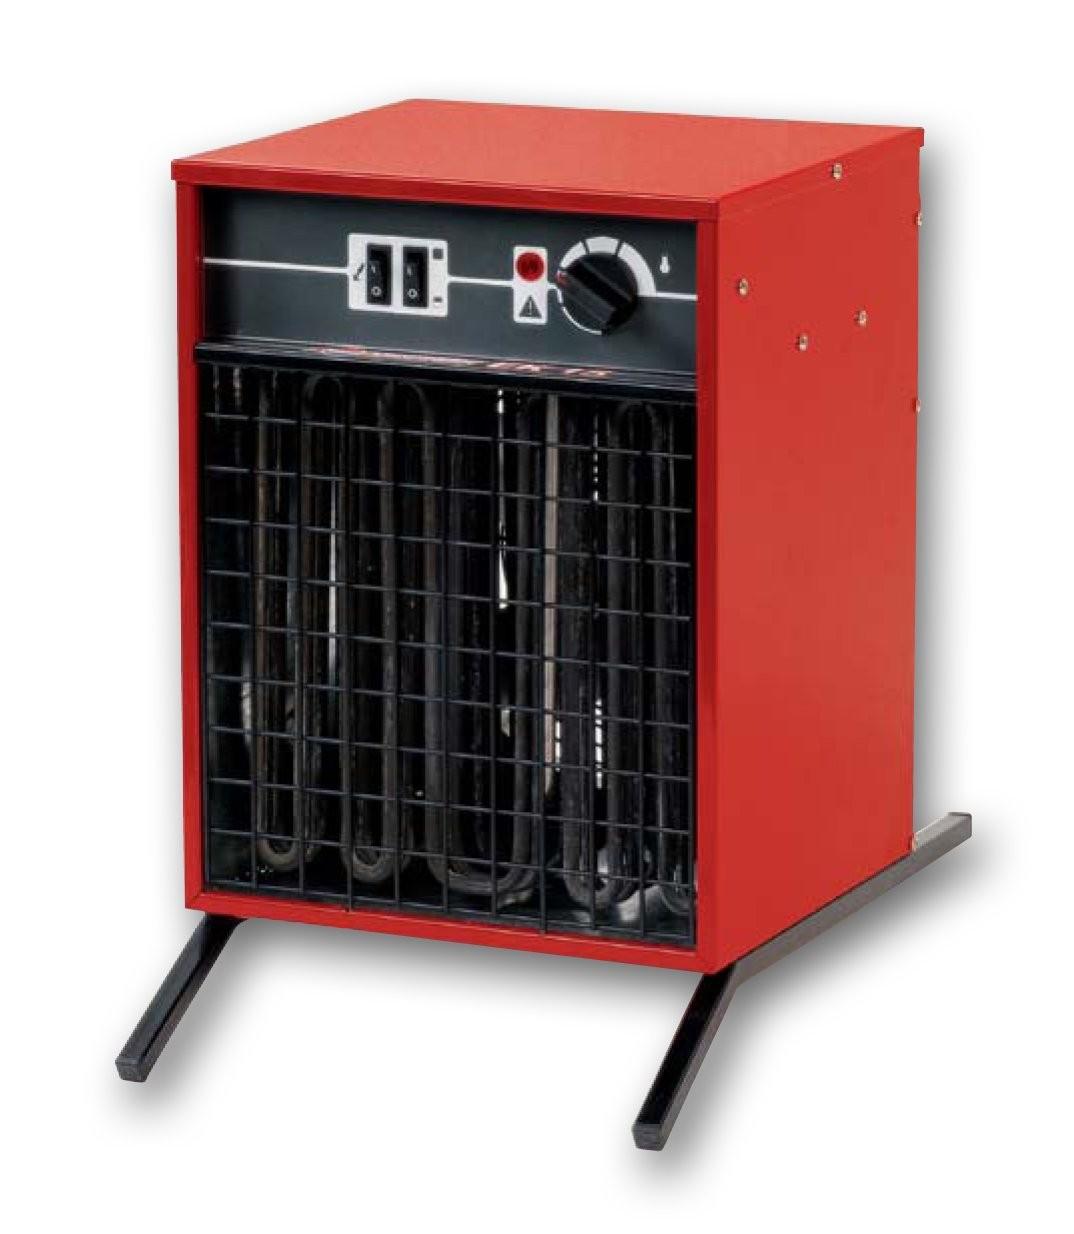 Generatori di aria calda di grossa portata - Noleggio Riscaldamento